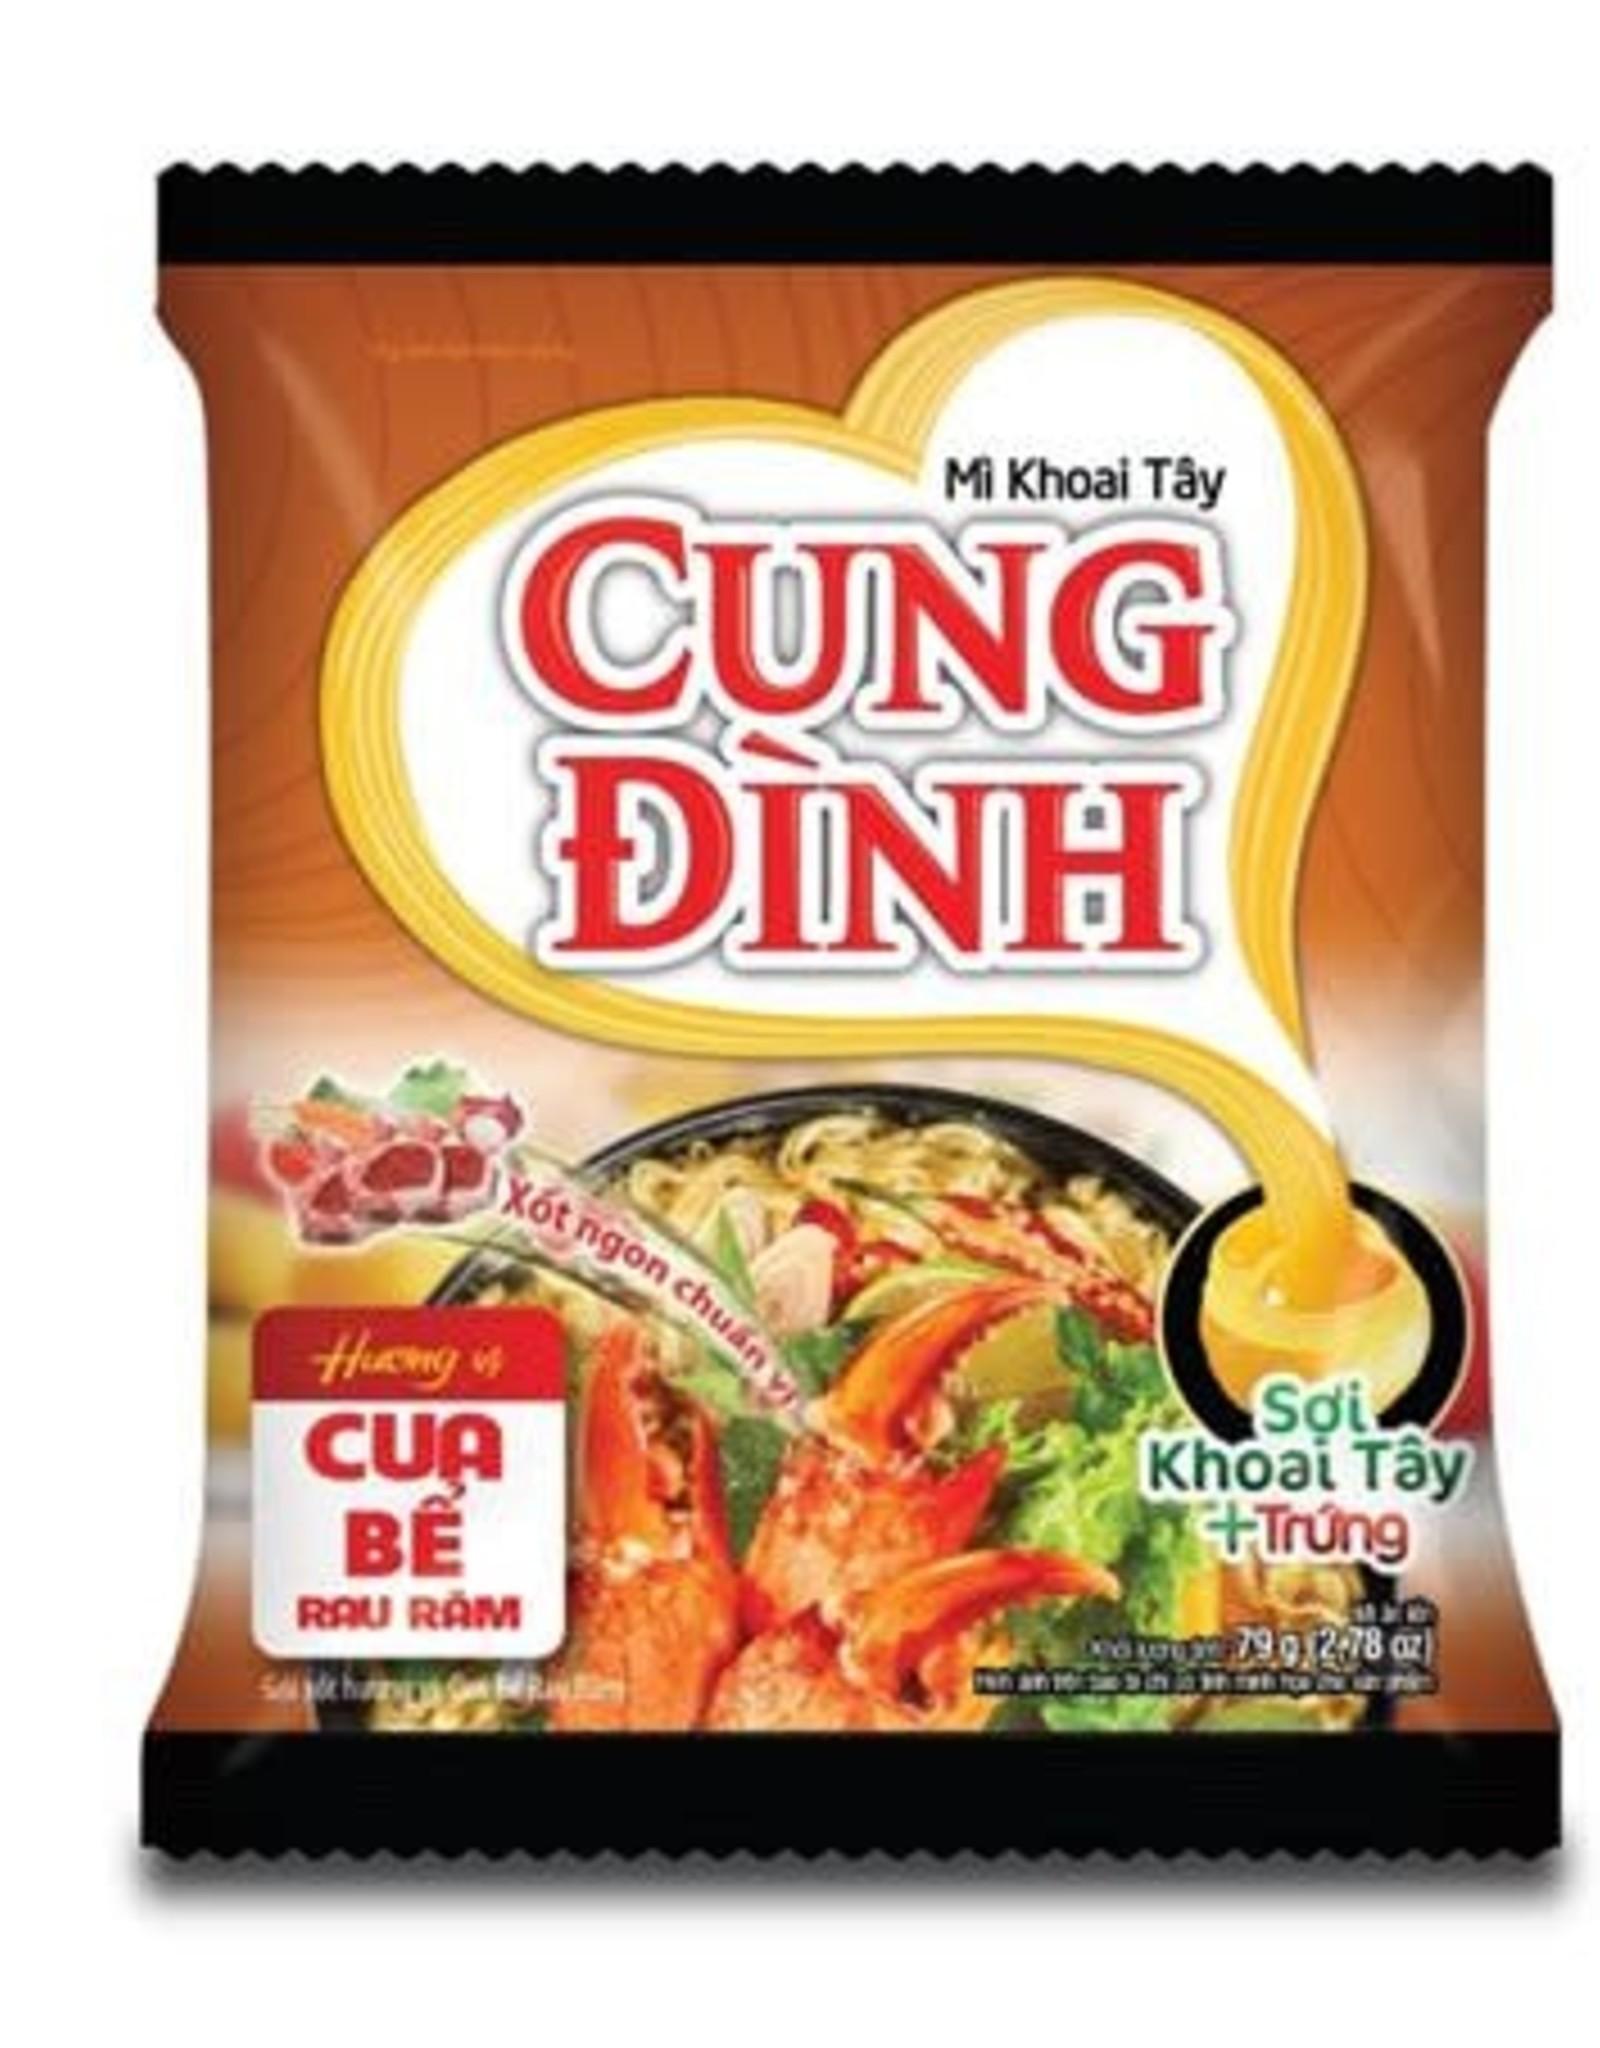 Cung Dinh Inst. Noodles - Crab with Laksa Flavor Cung Dinh 79g